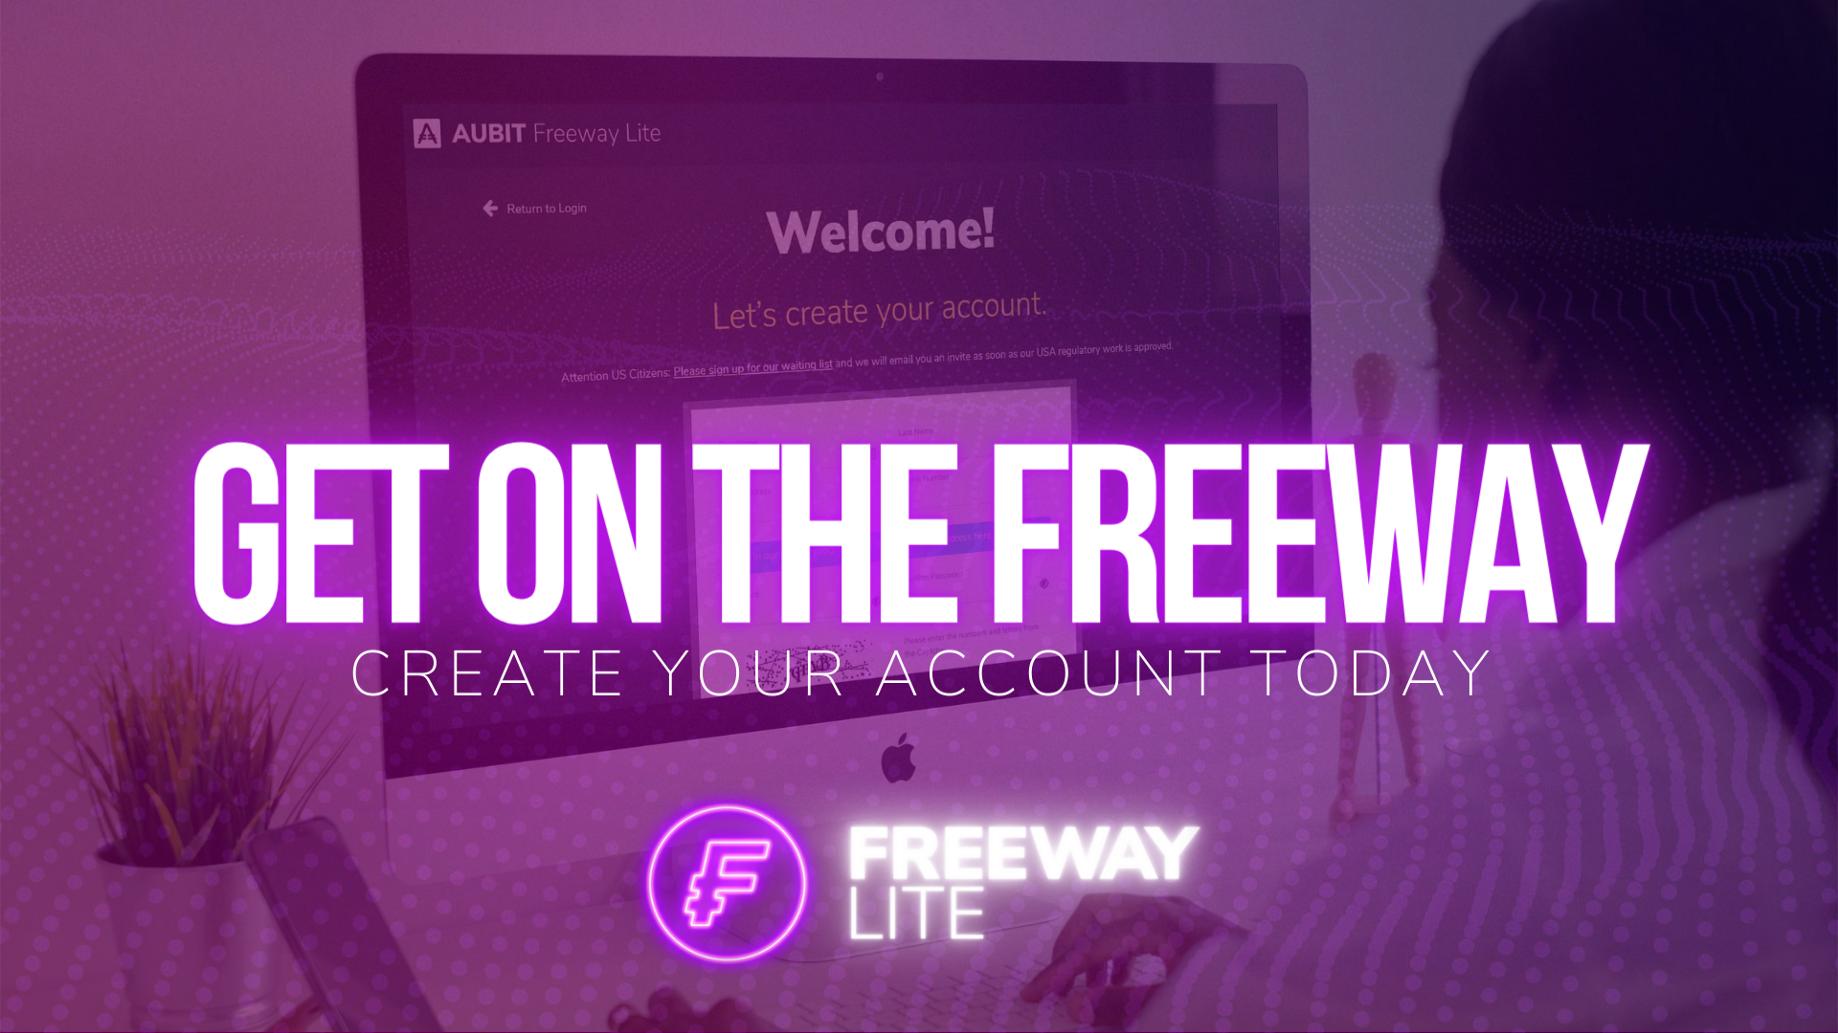 Blog AuBit Freeway Lite Create Account